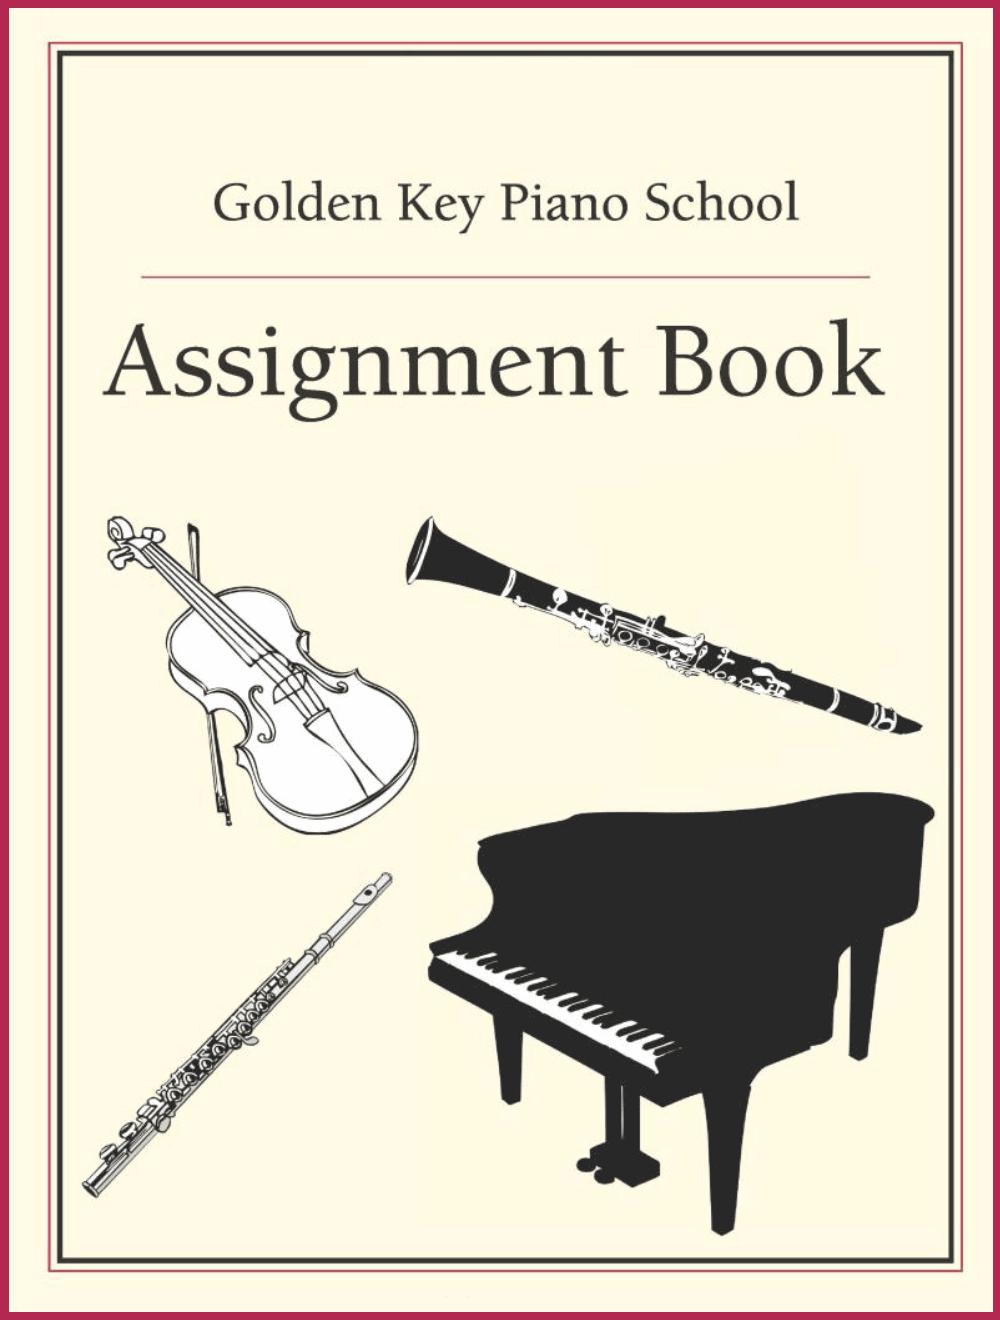 Assignment Book - Piano lessons Manhattan